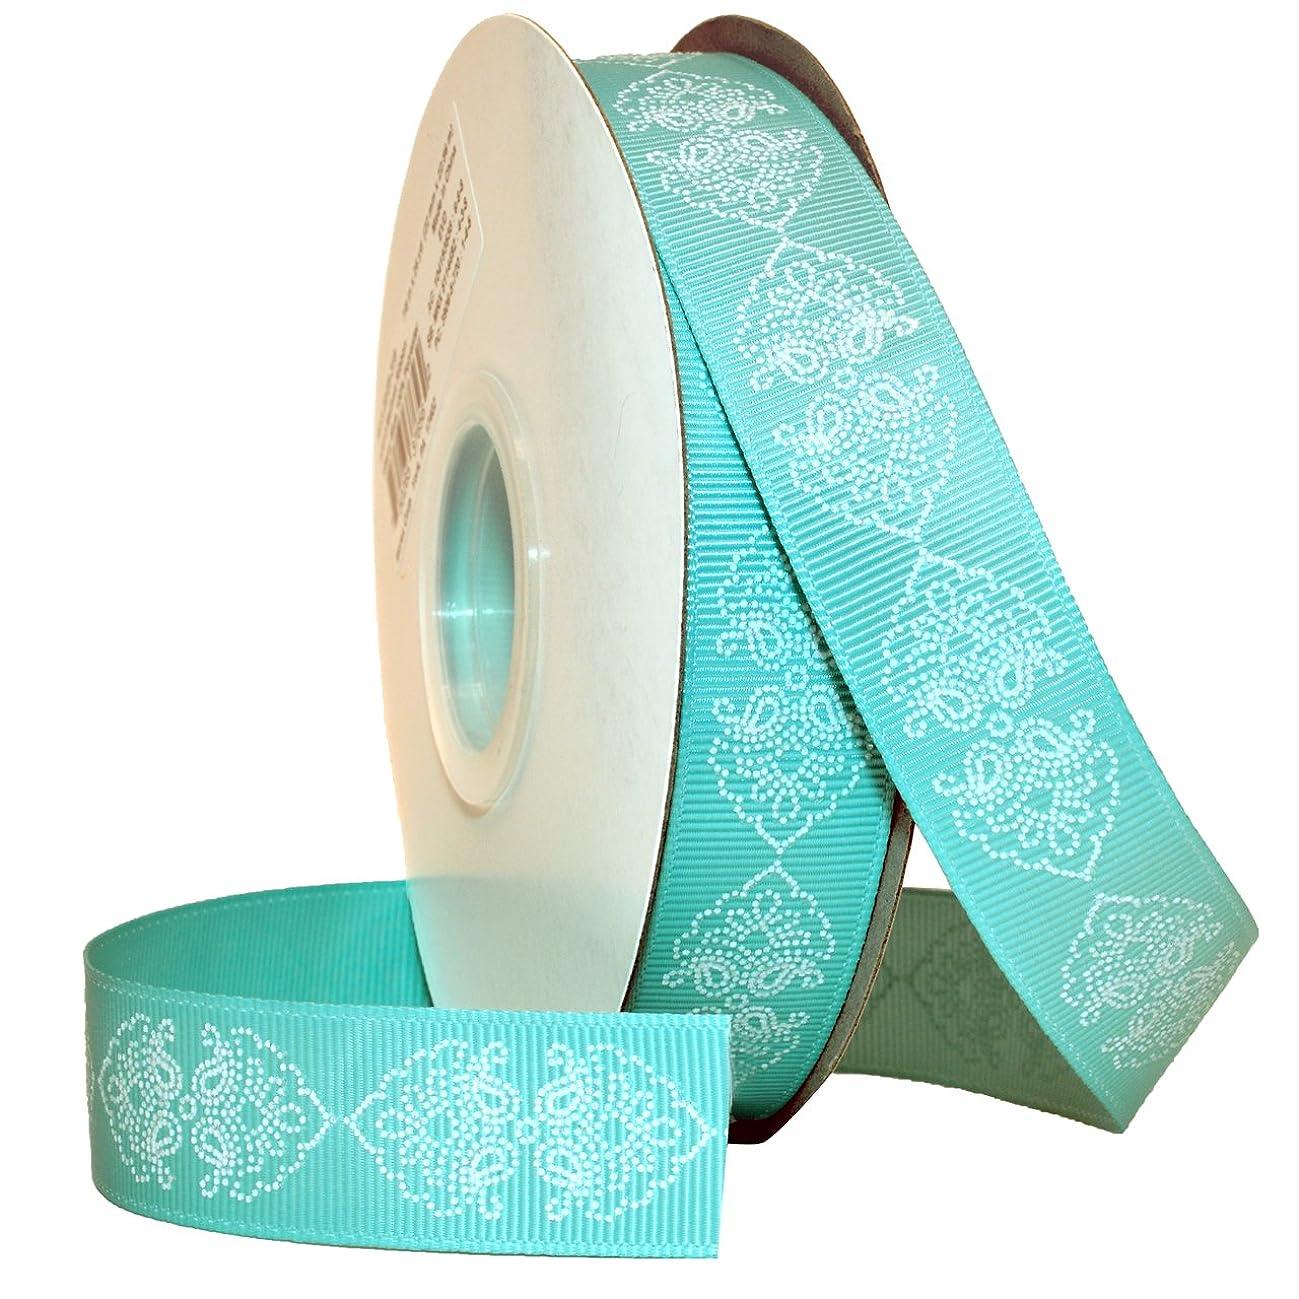 Morex Ribbon Melissa, Grosgrain, 7/8-Inch by 25-Yard, Tiara Blue